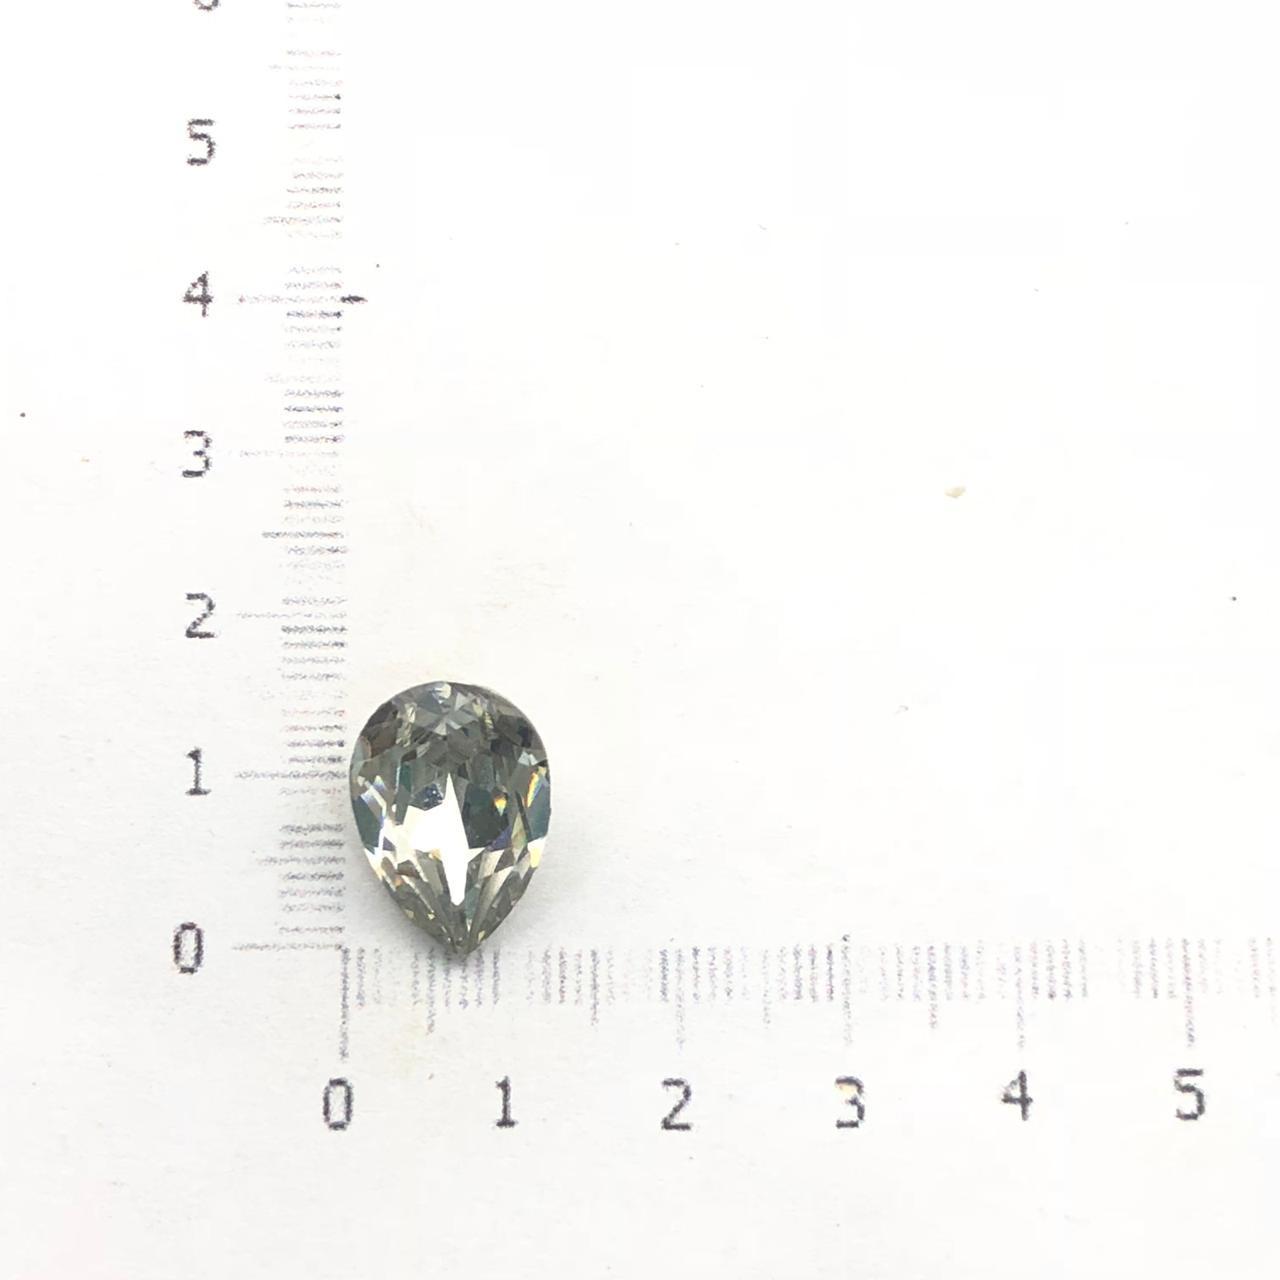 CHT709 - Chaton Gota 10x14 Base Côncava Cristal - 4unids